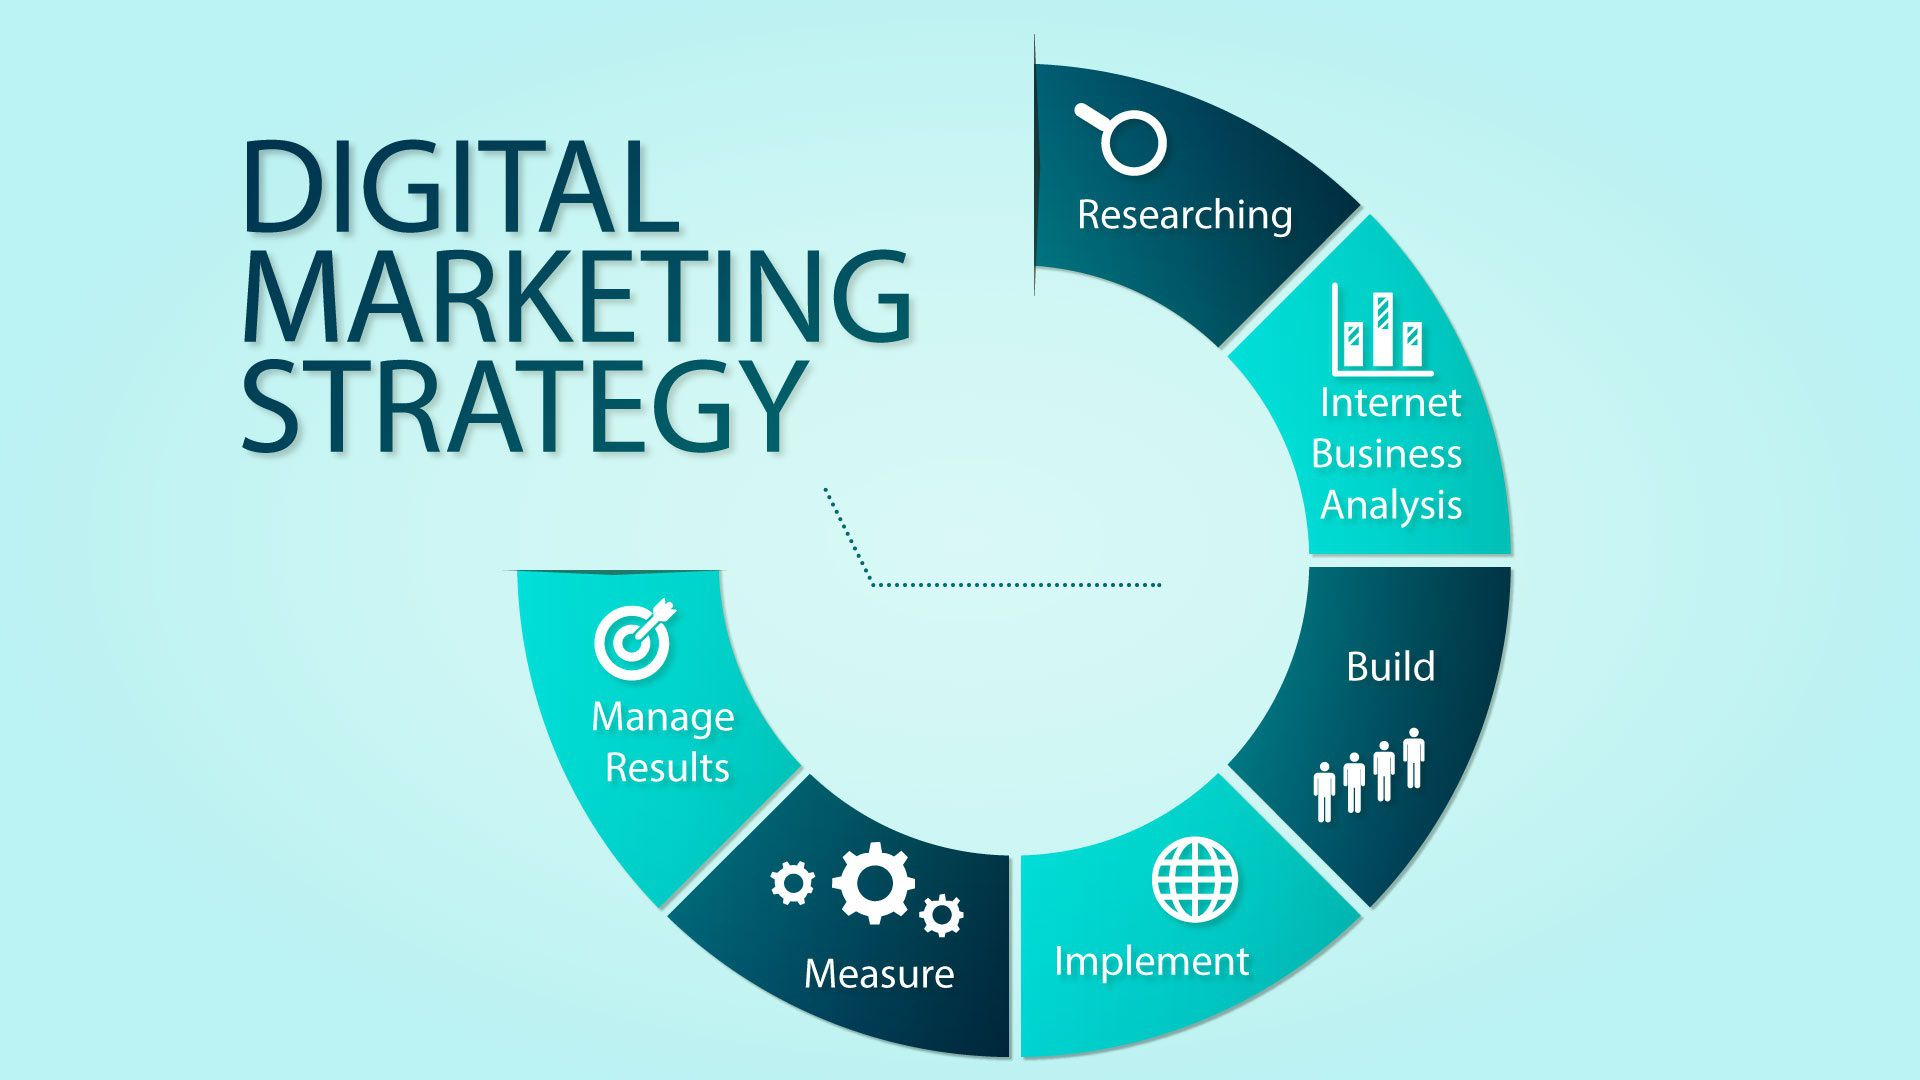 007 Top Digital Marketing Plan Template 2019 High Resolution Full